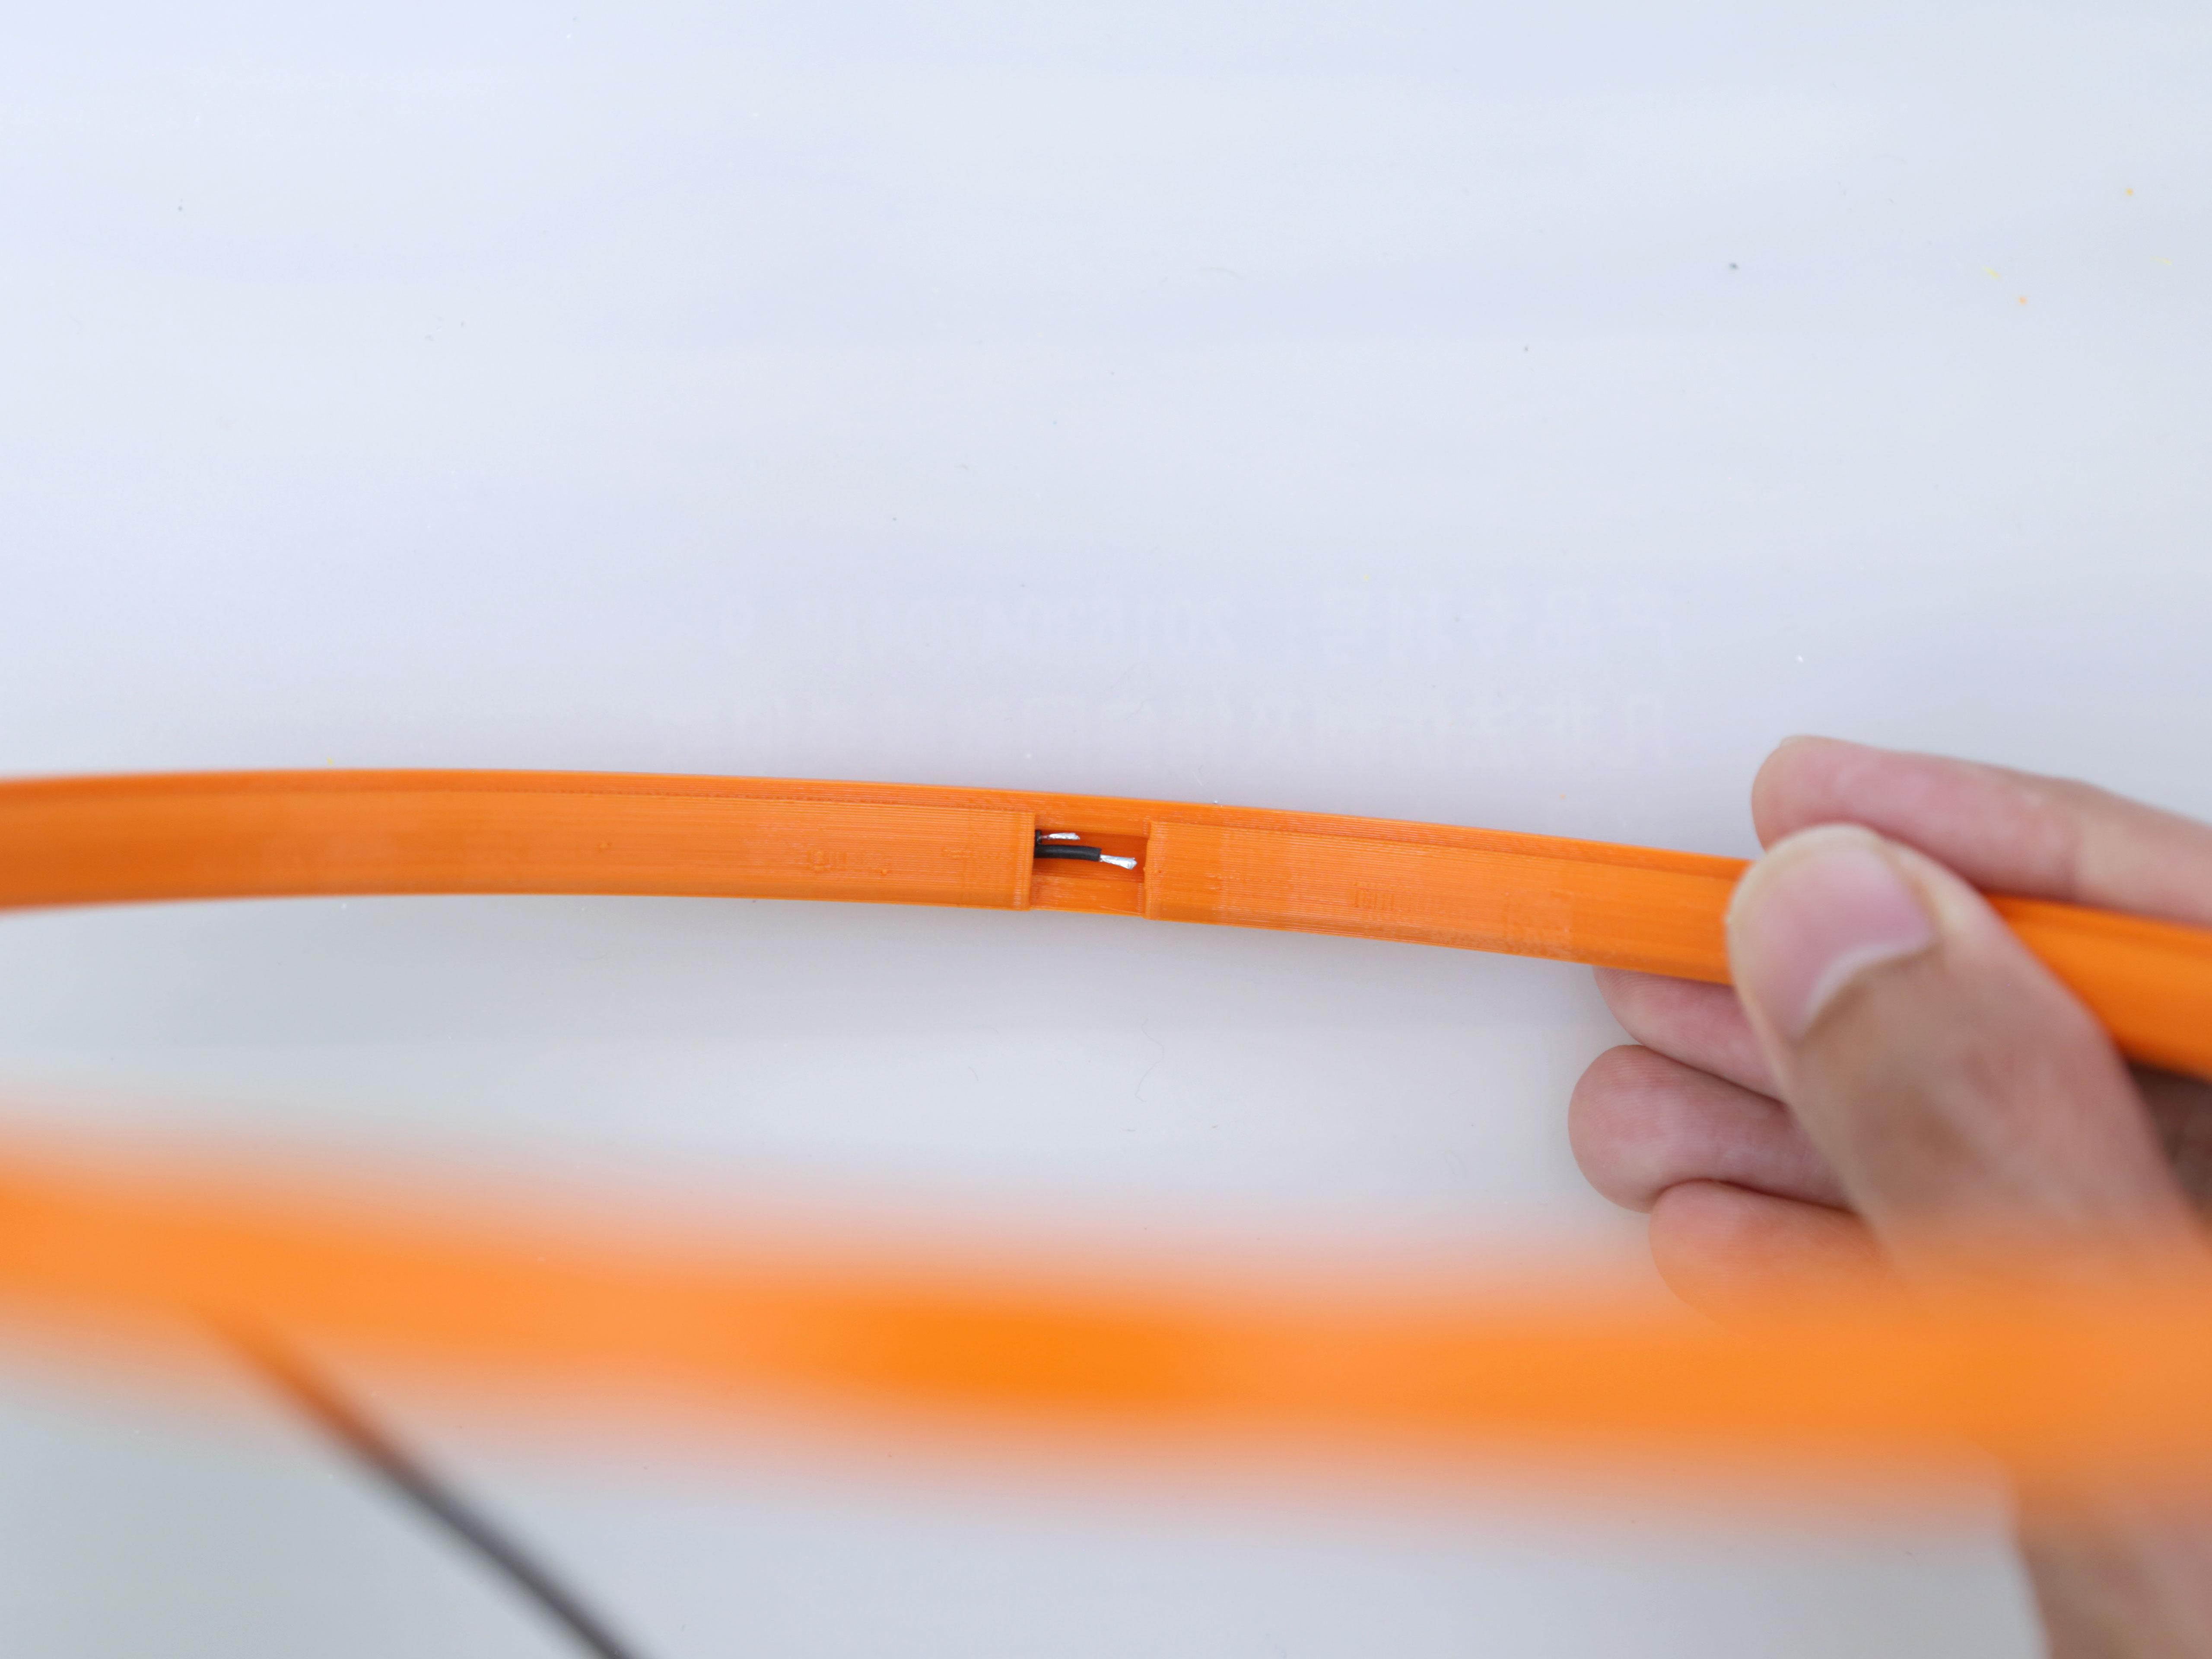 led_matrices_ir-rx-hoop-wire-slit.jpg